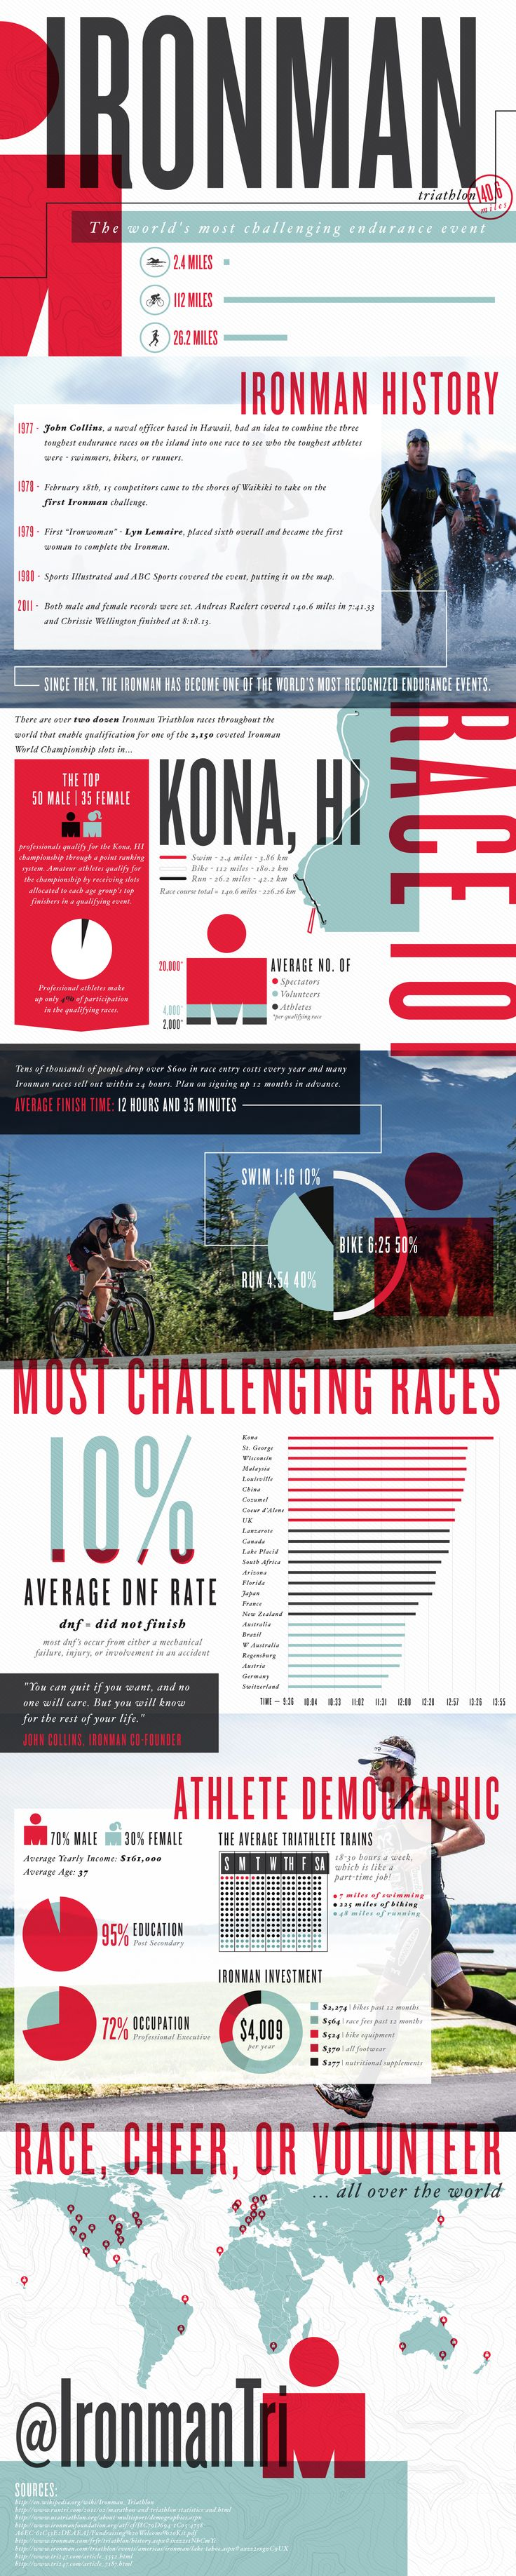 Ironman Triathlon: An Endurance Event | Infographic - Lemonly